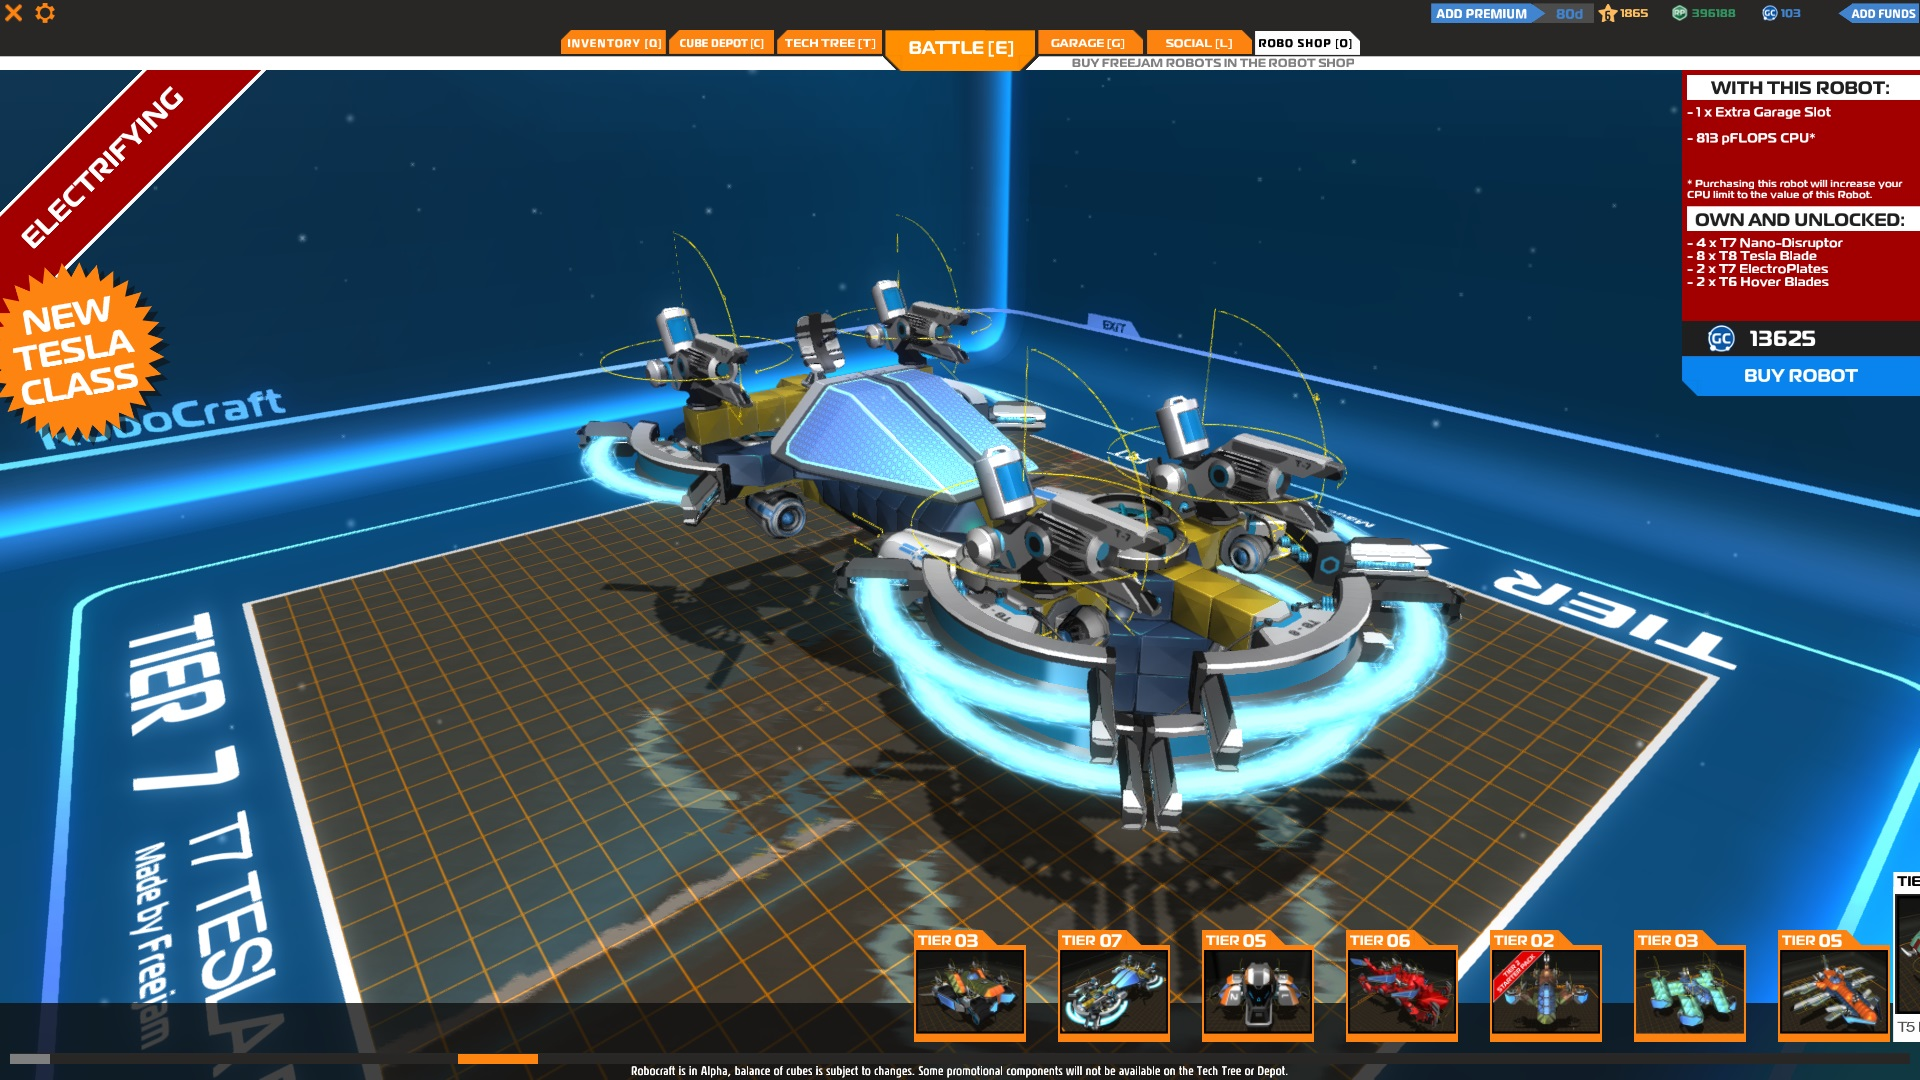 Steam Community :: Guide :: Roboshop Robot's - How to build